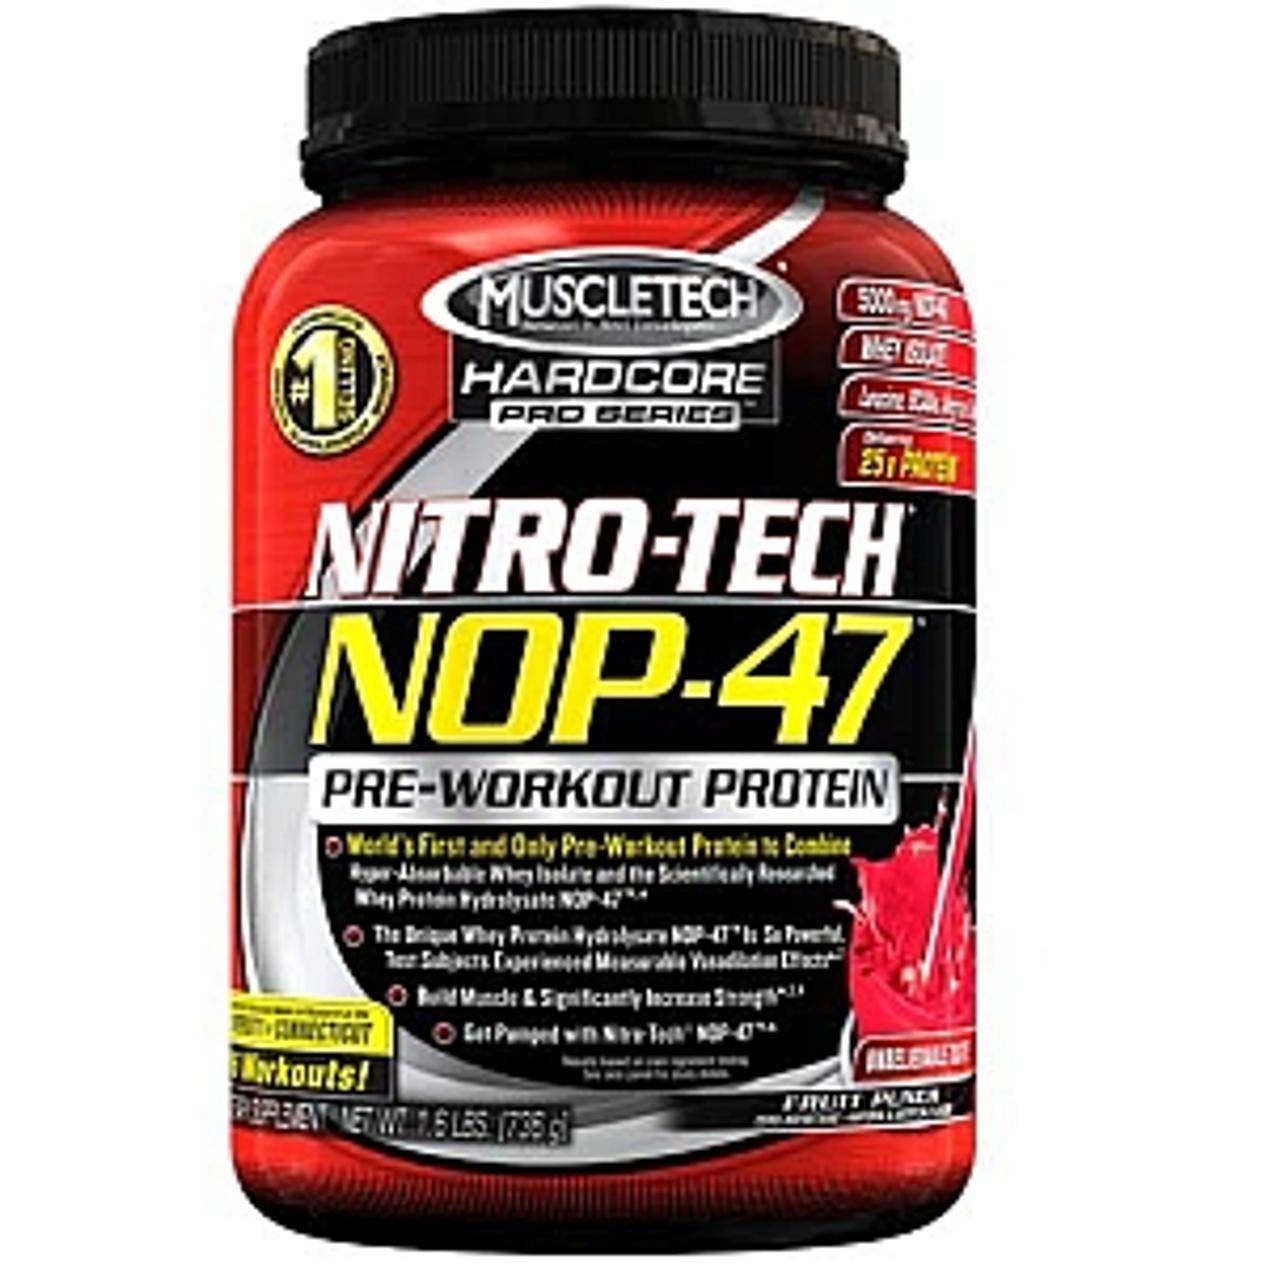 NitroTech Nop47 MuscleTech 1.6lb